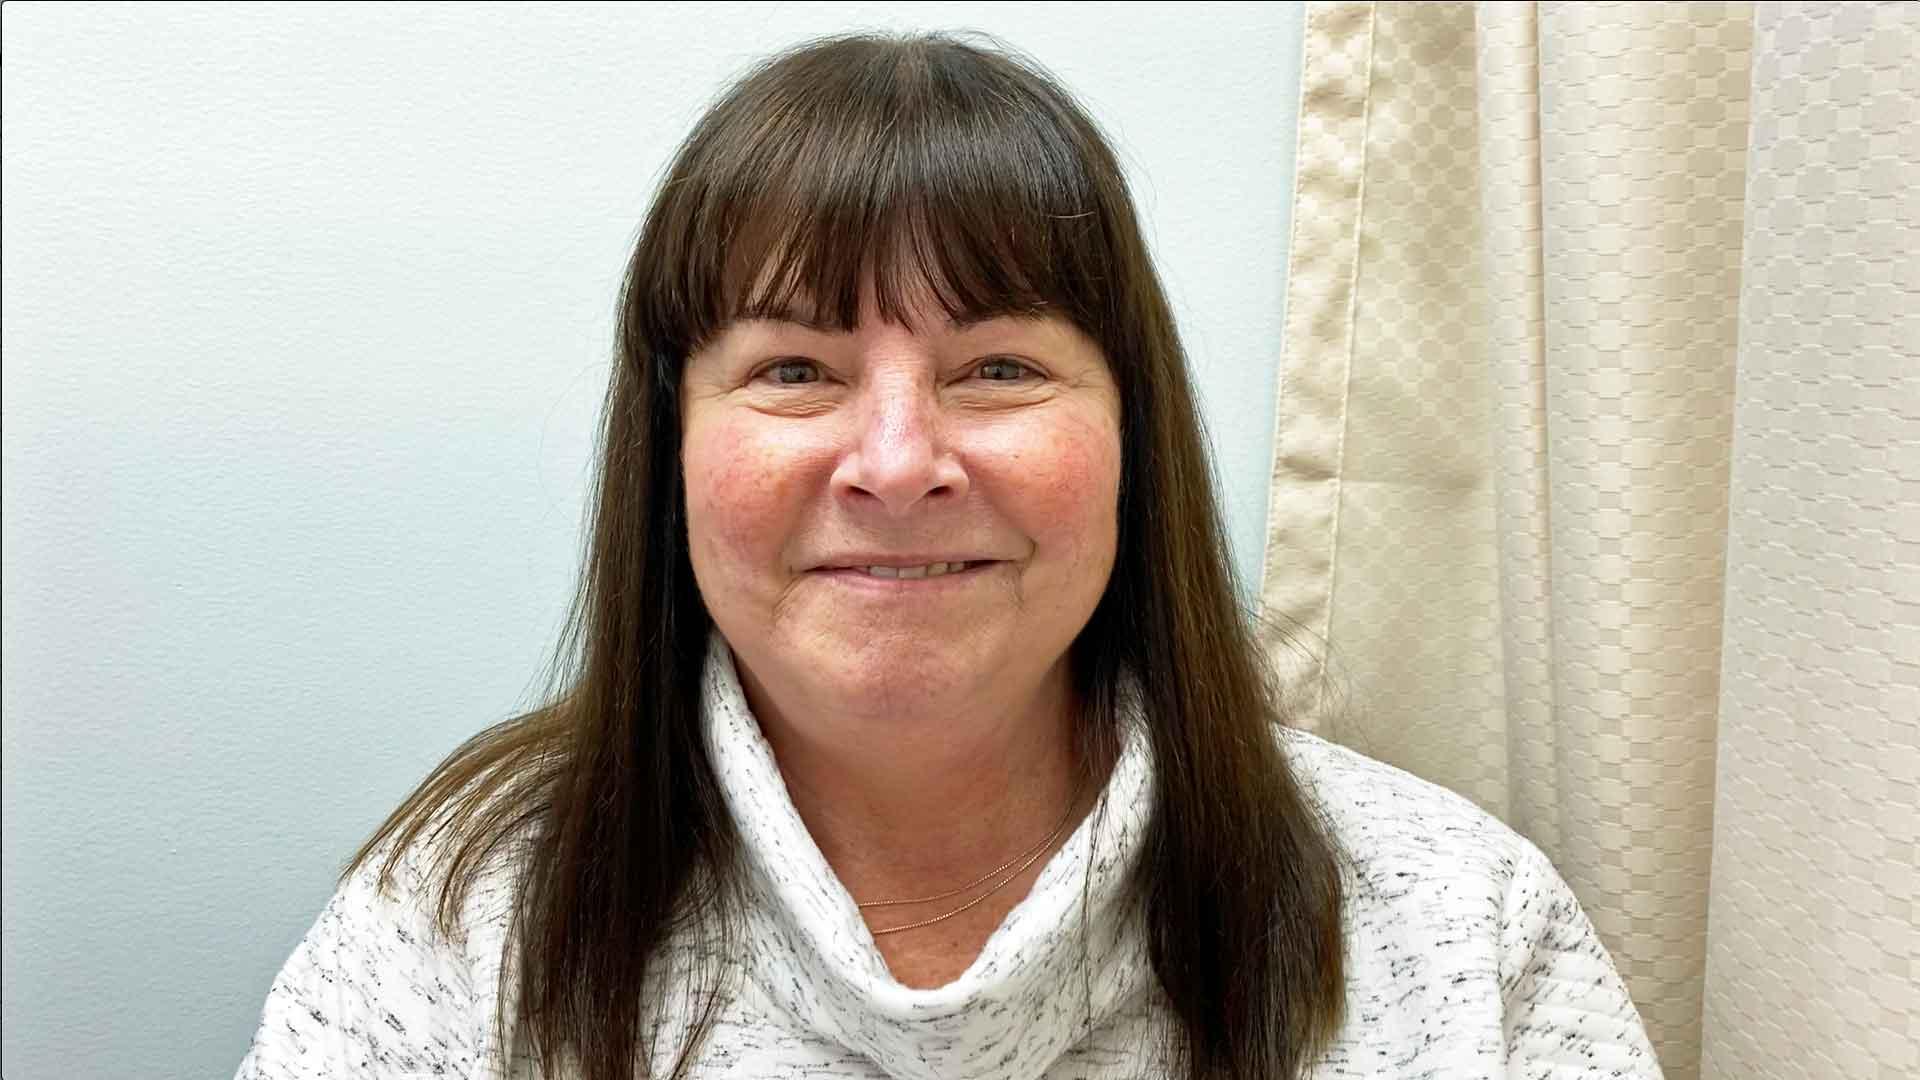 Julie bilateral knee orthobiolic treatment